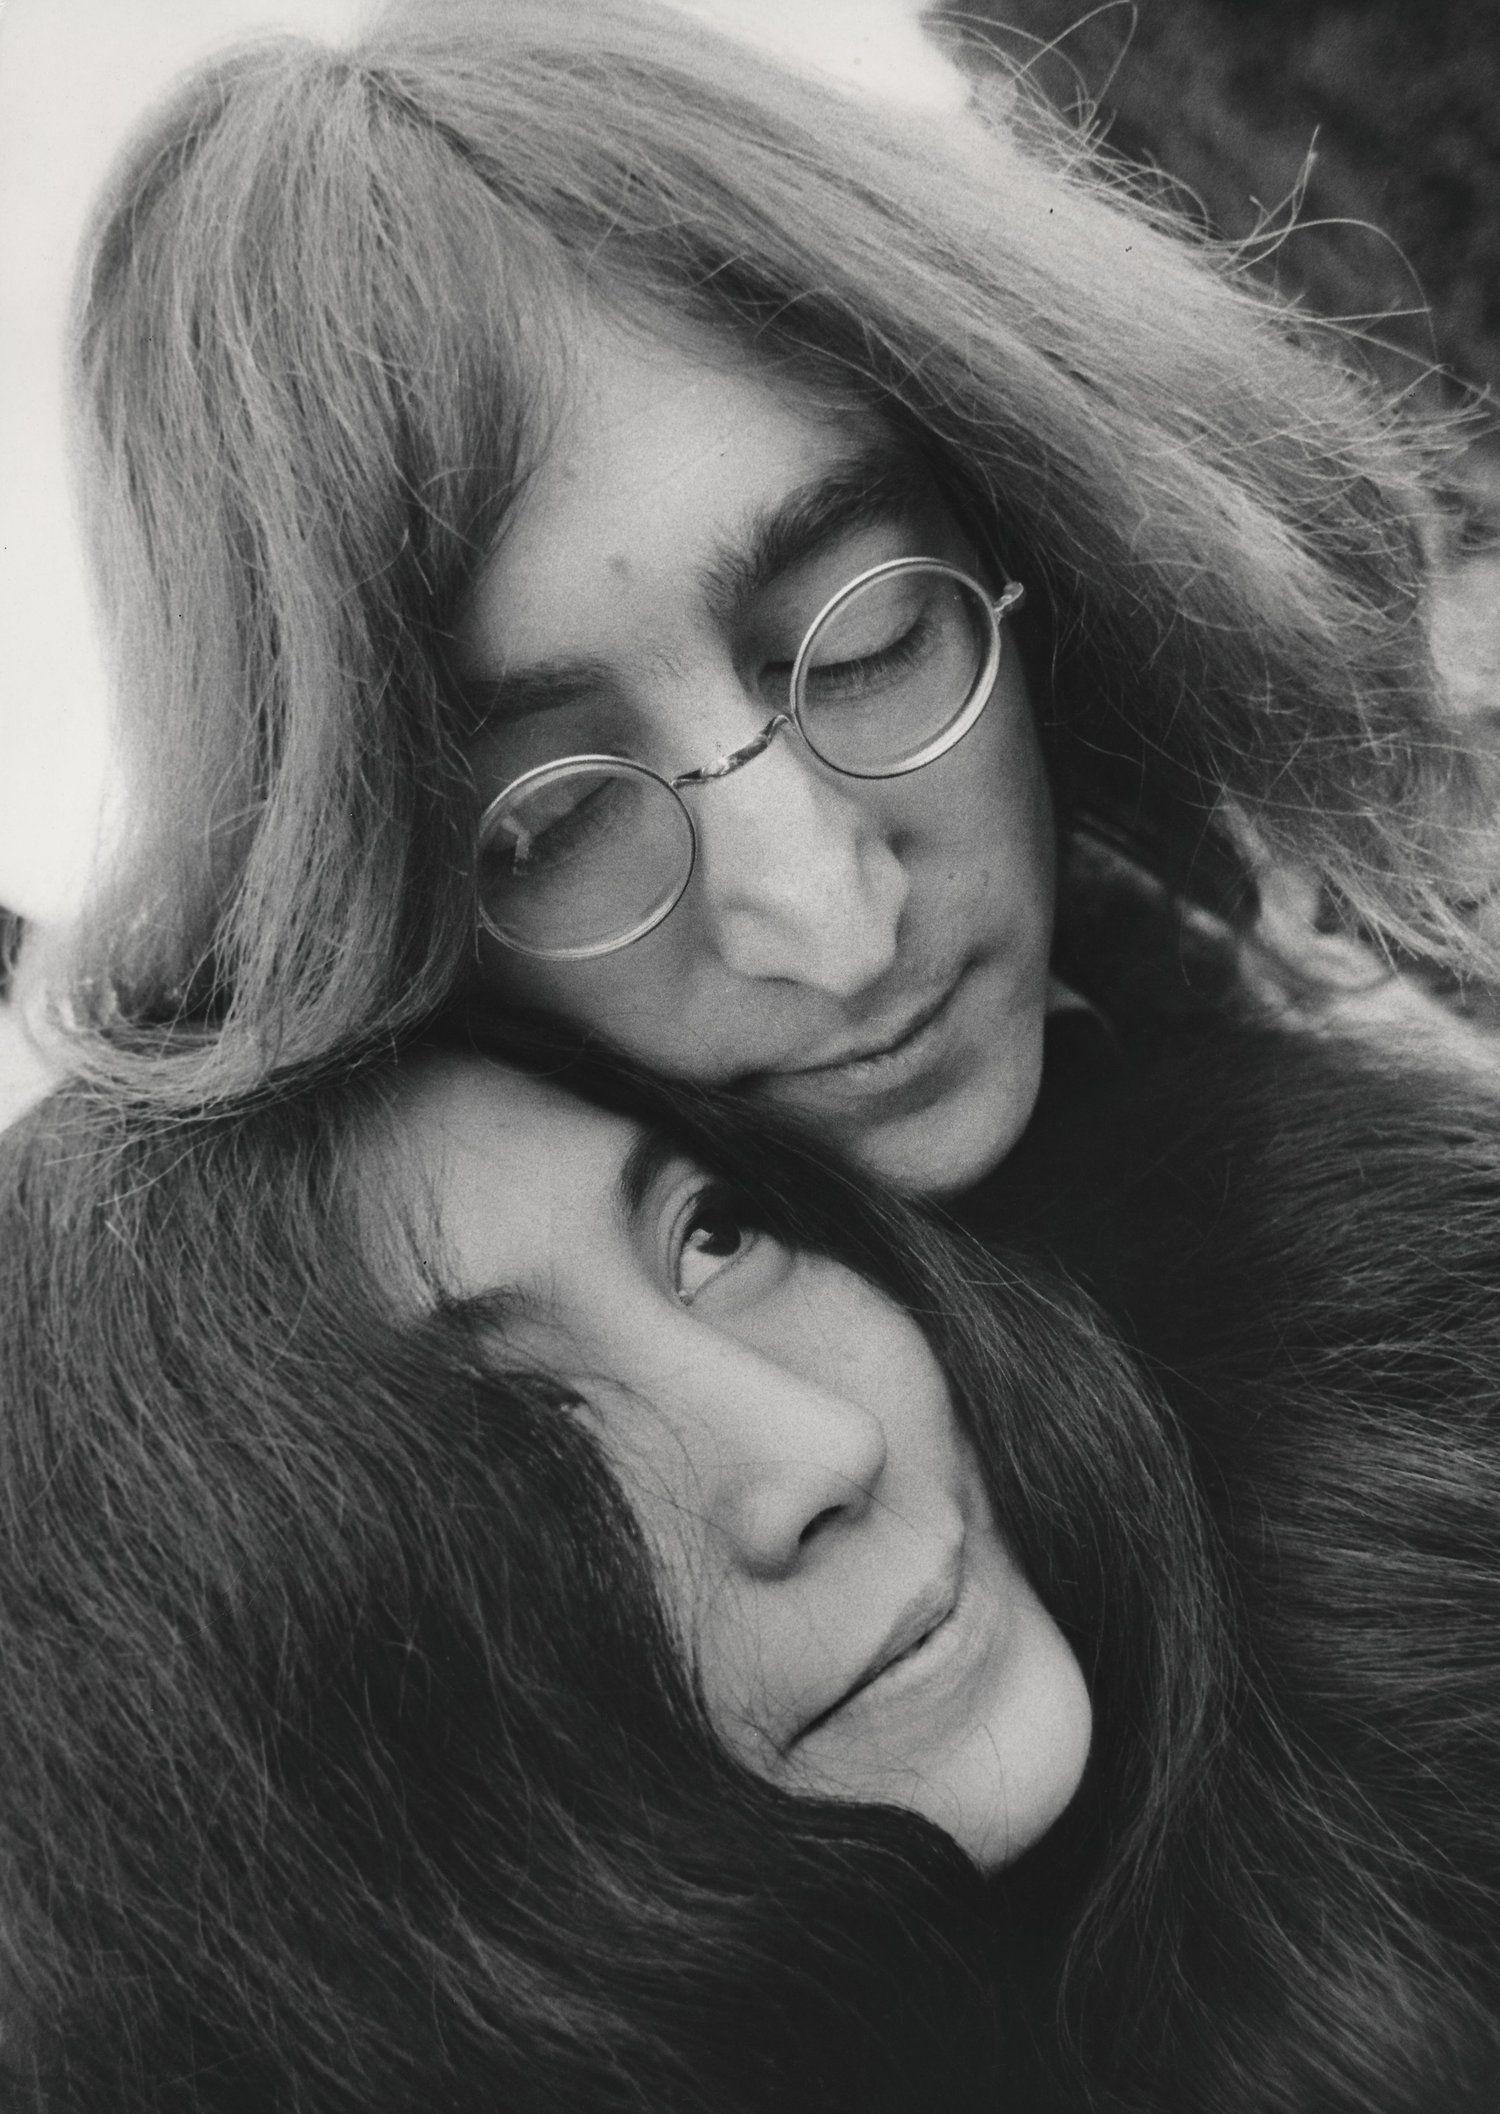 Ray Green - John Lennon and Yoko Ono: Lovers Fine Art Print